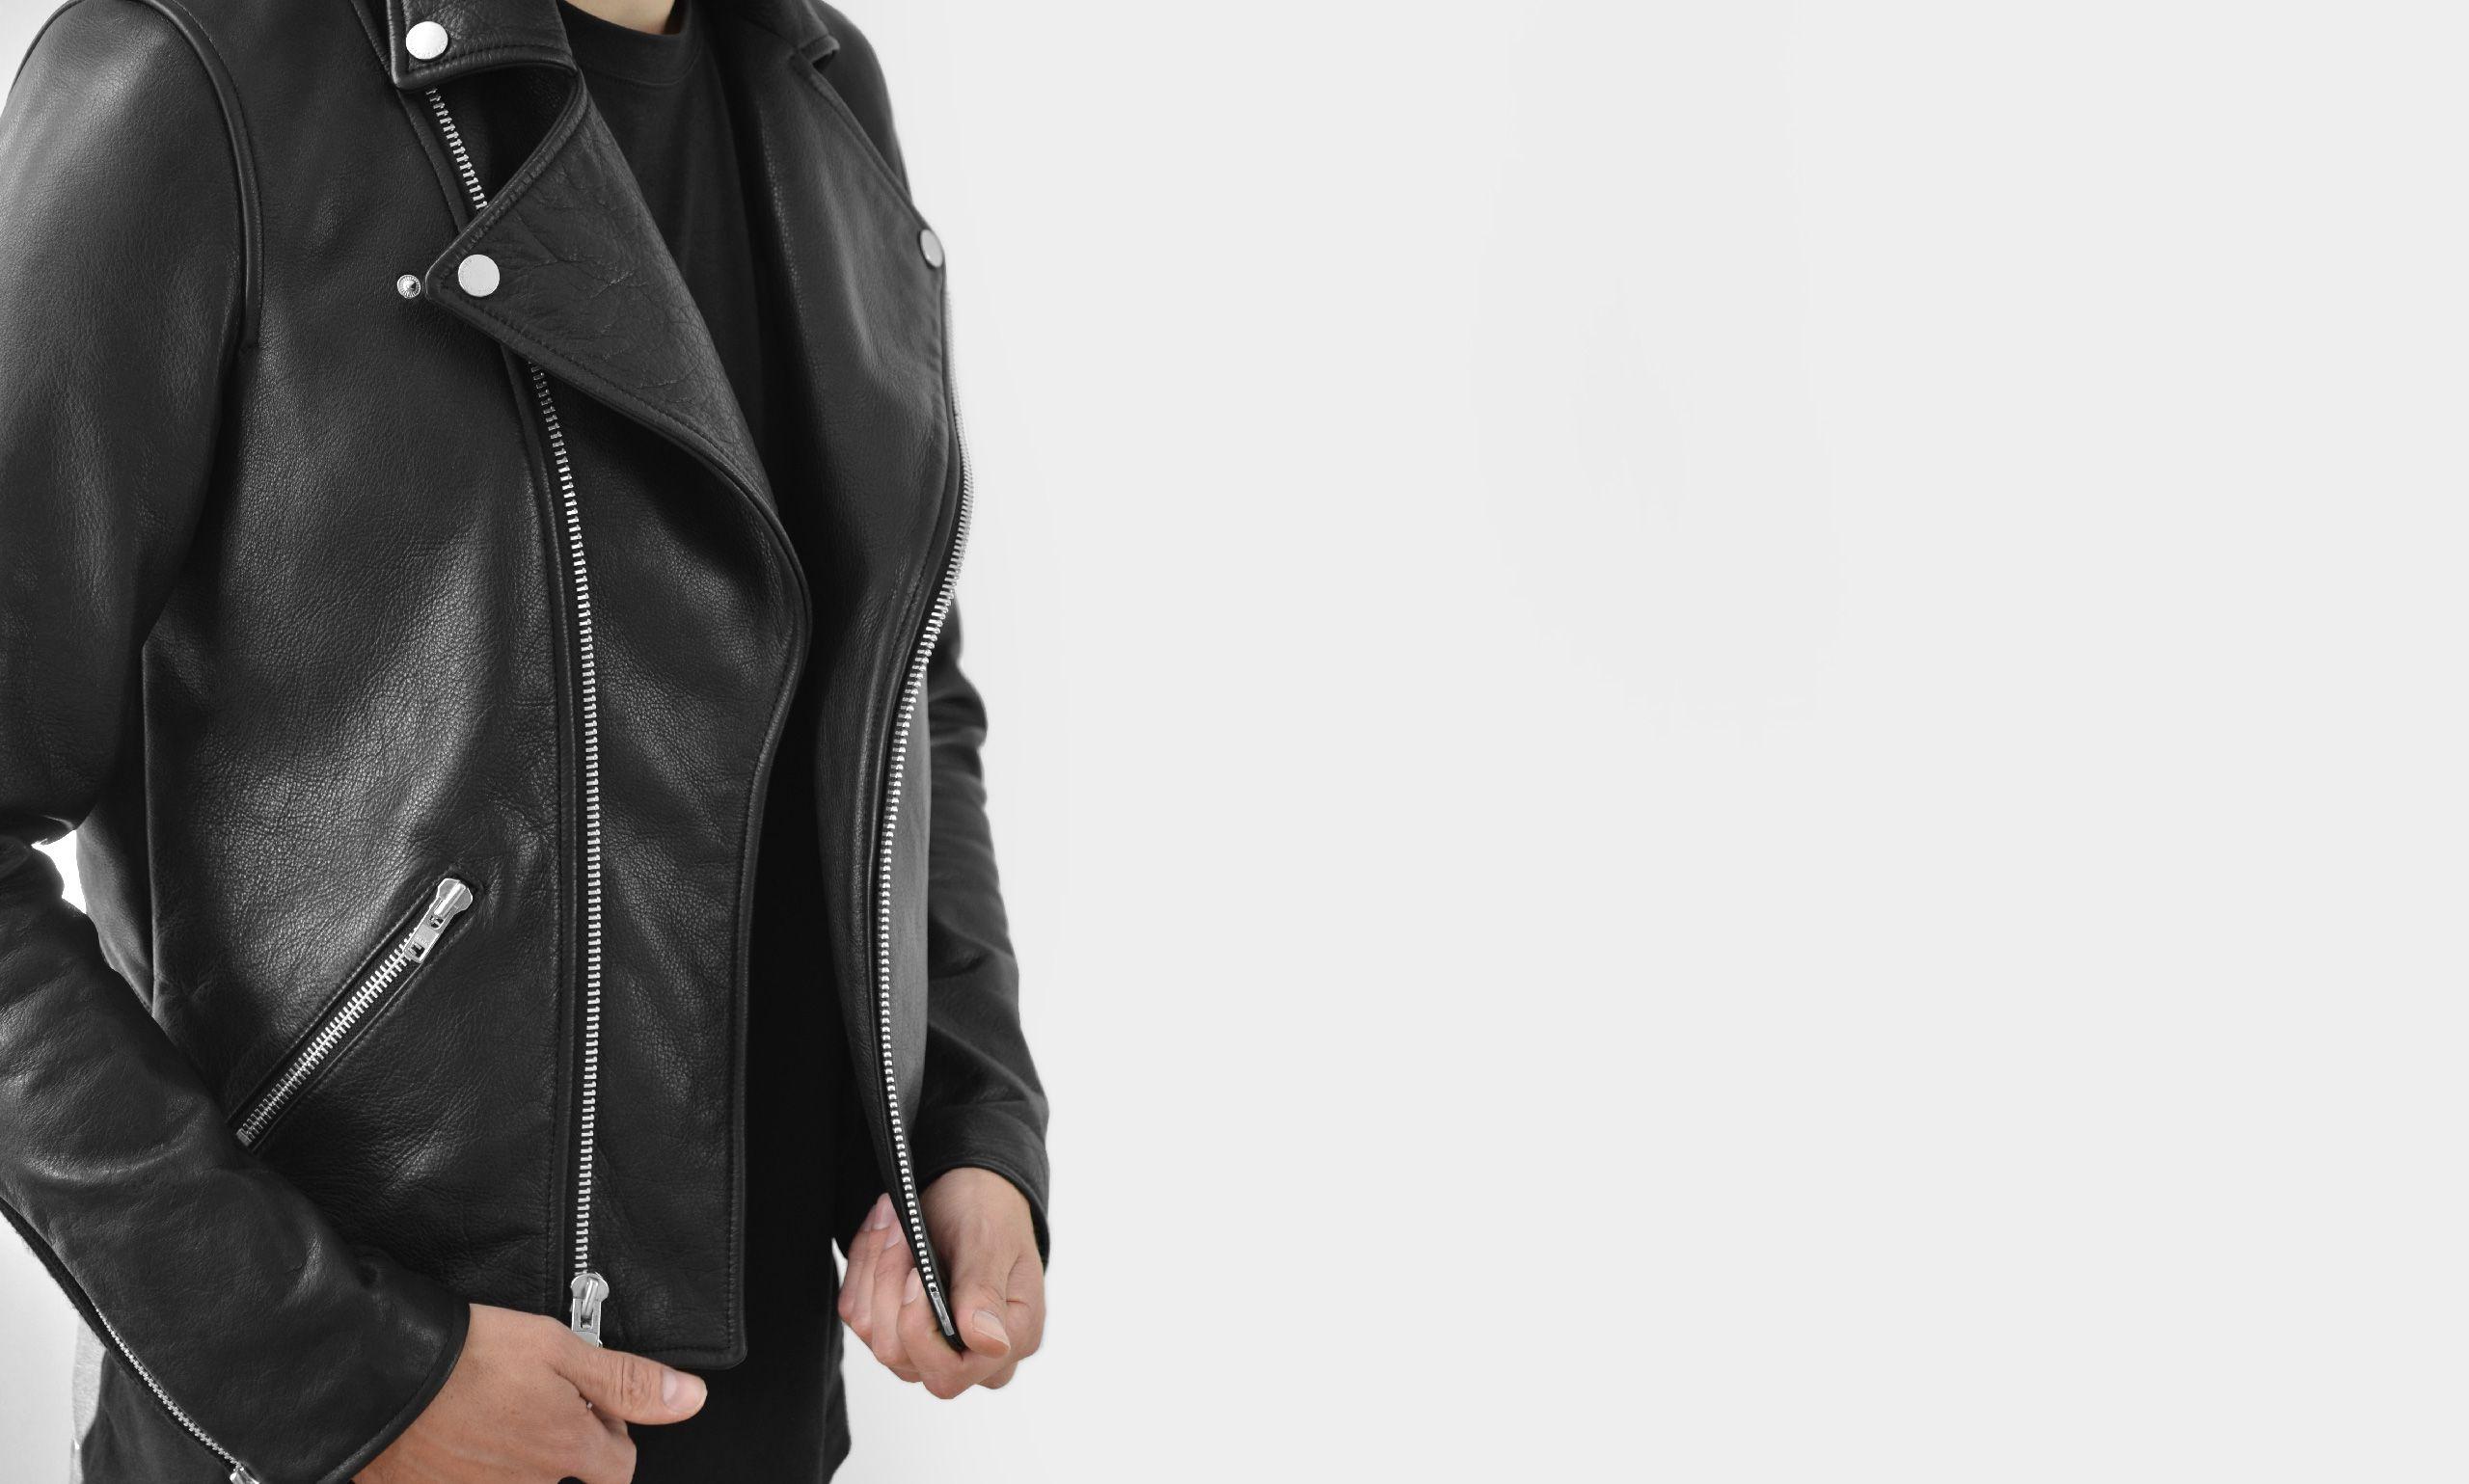 Lautner Leather Biker Jacket The Arrivals Leather Biker Jacket Jackets Menswear [ 1539 x 2560 Pixel ]